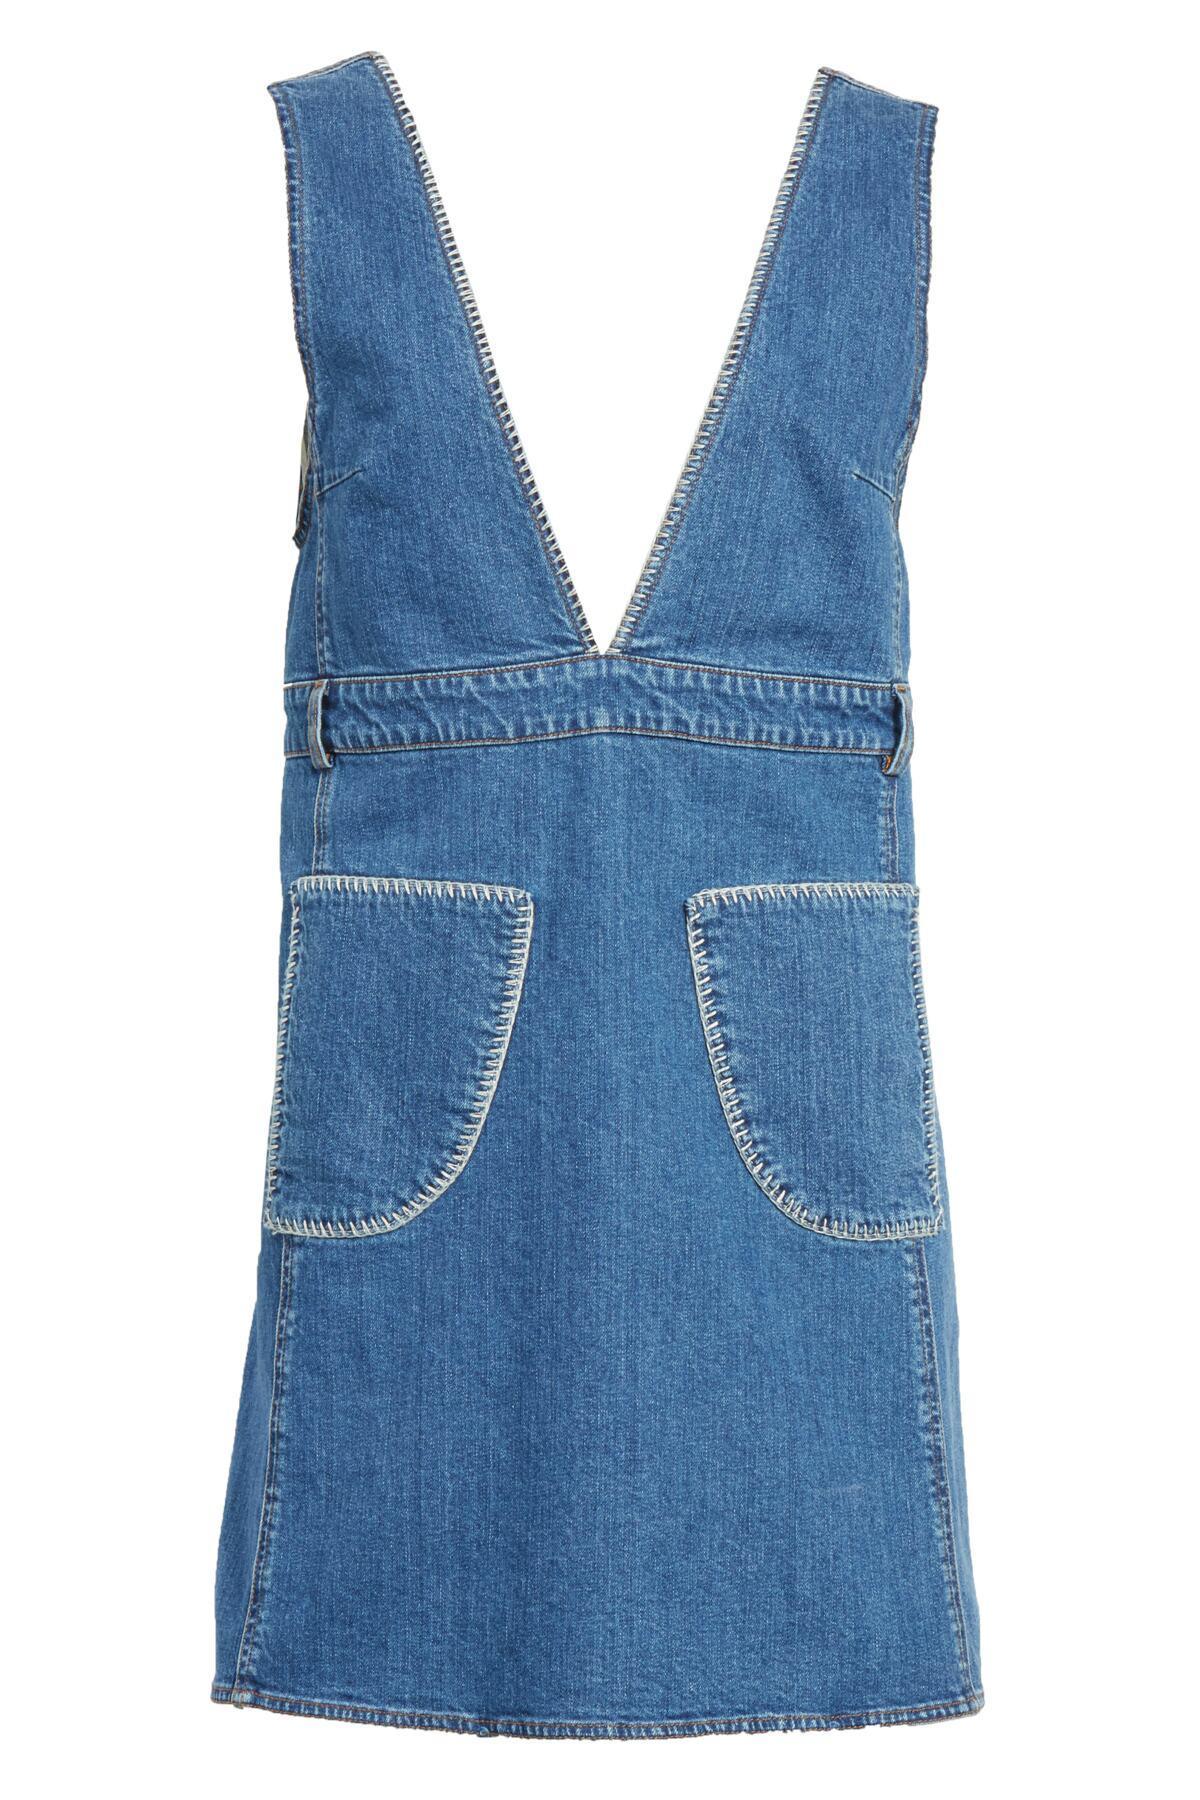 7ad60bcbd16a Lyst - See By Chloé Denim V-neck Dress in Blue - Save 19%